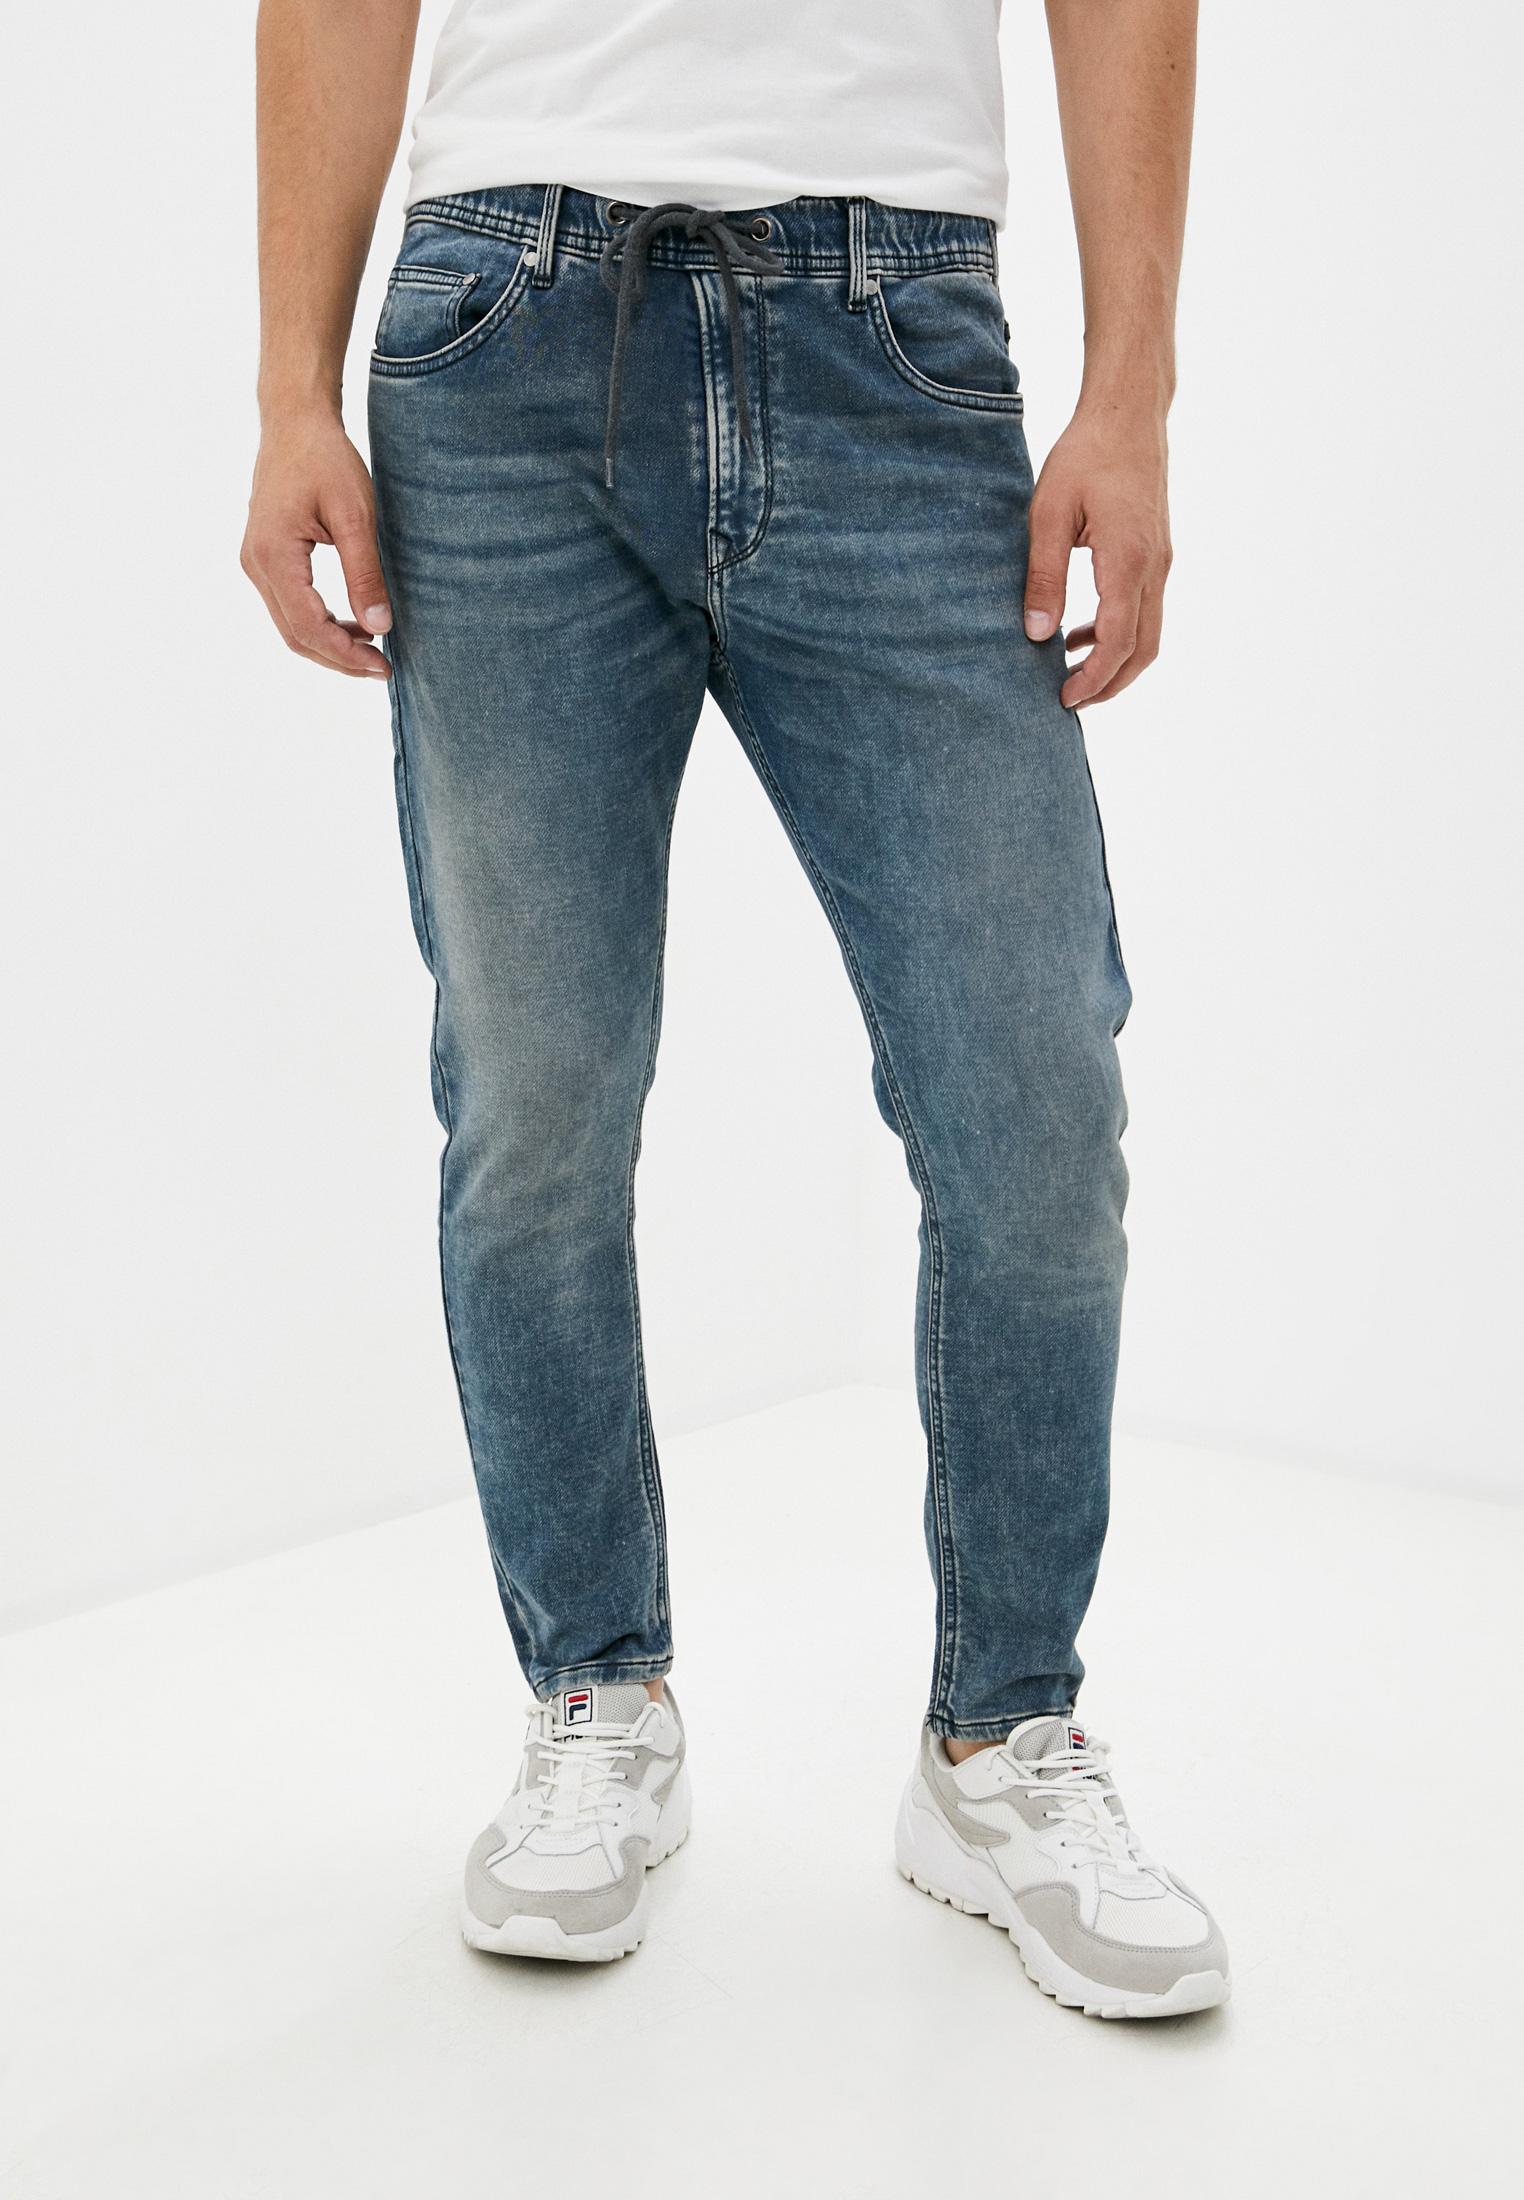 Зауженные джинсы Pepe Jeans (Пепе Джинс) PM204385XB9